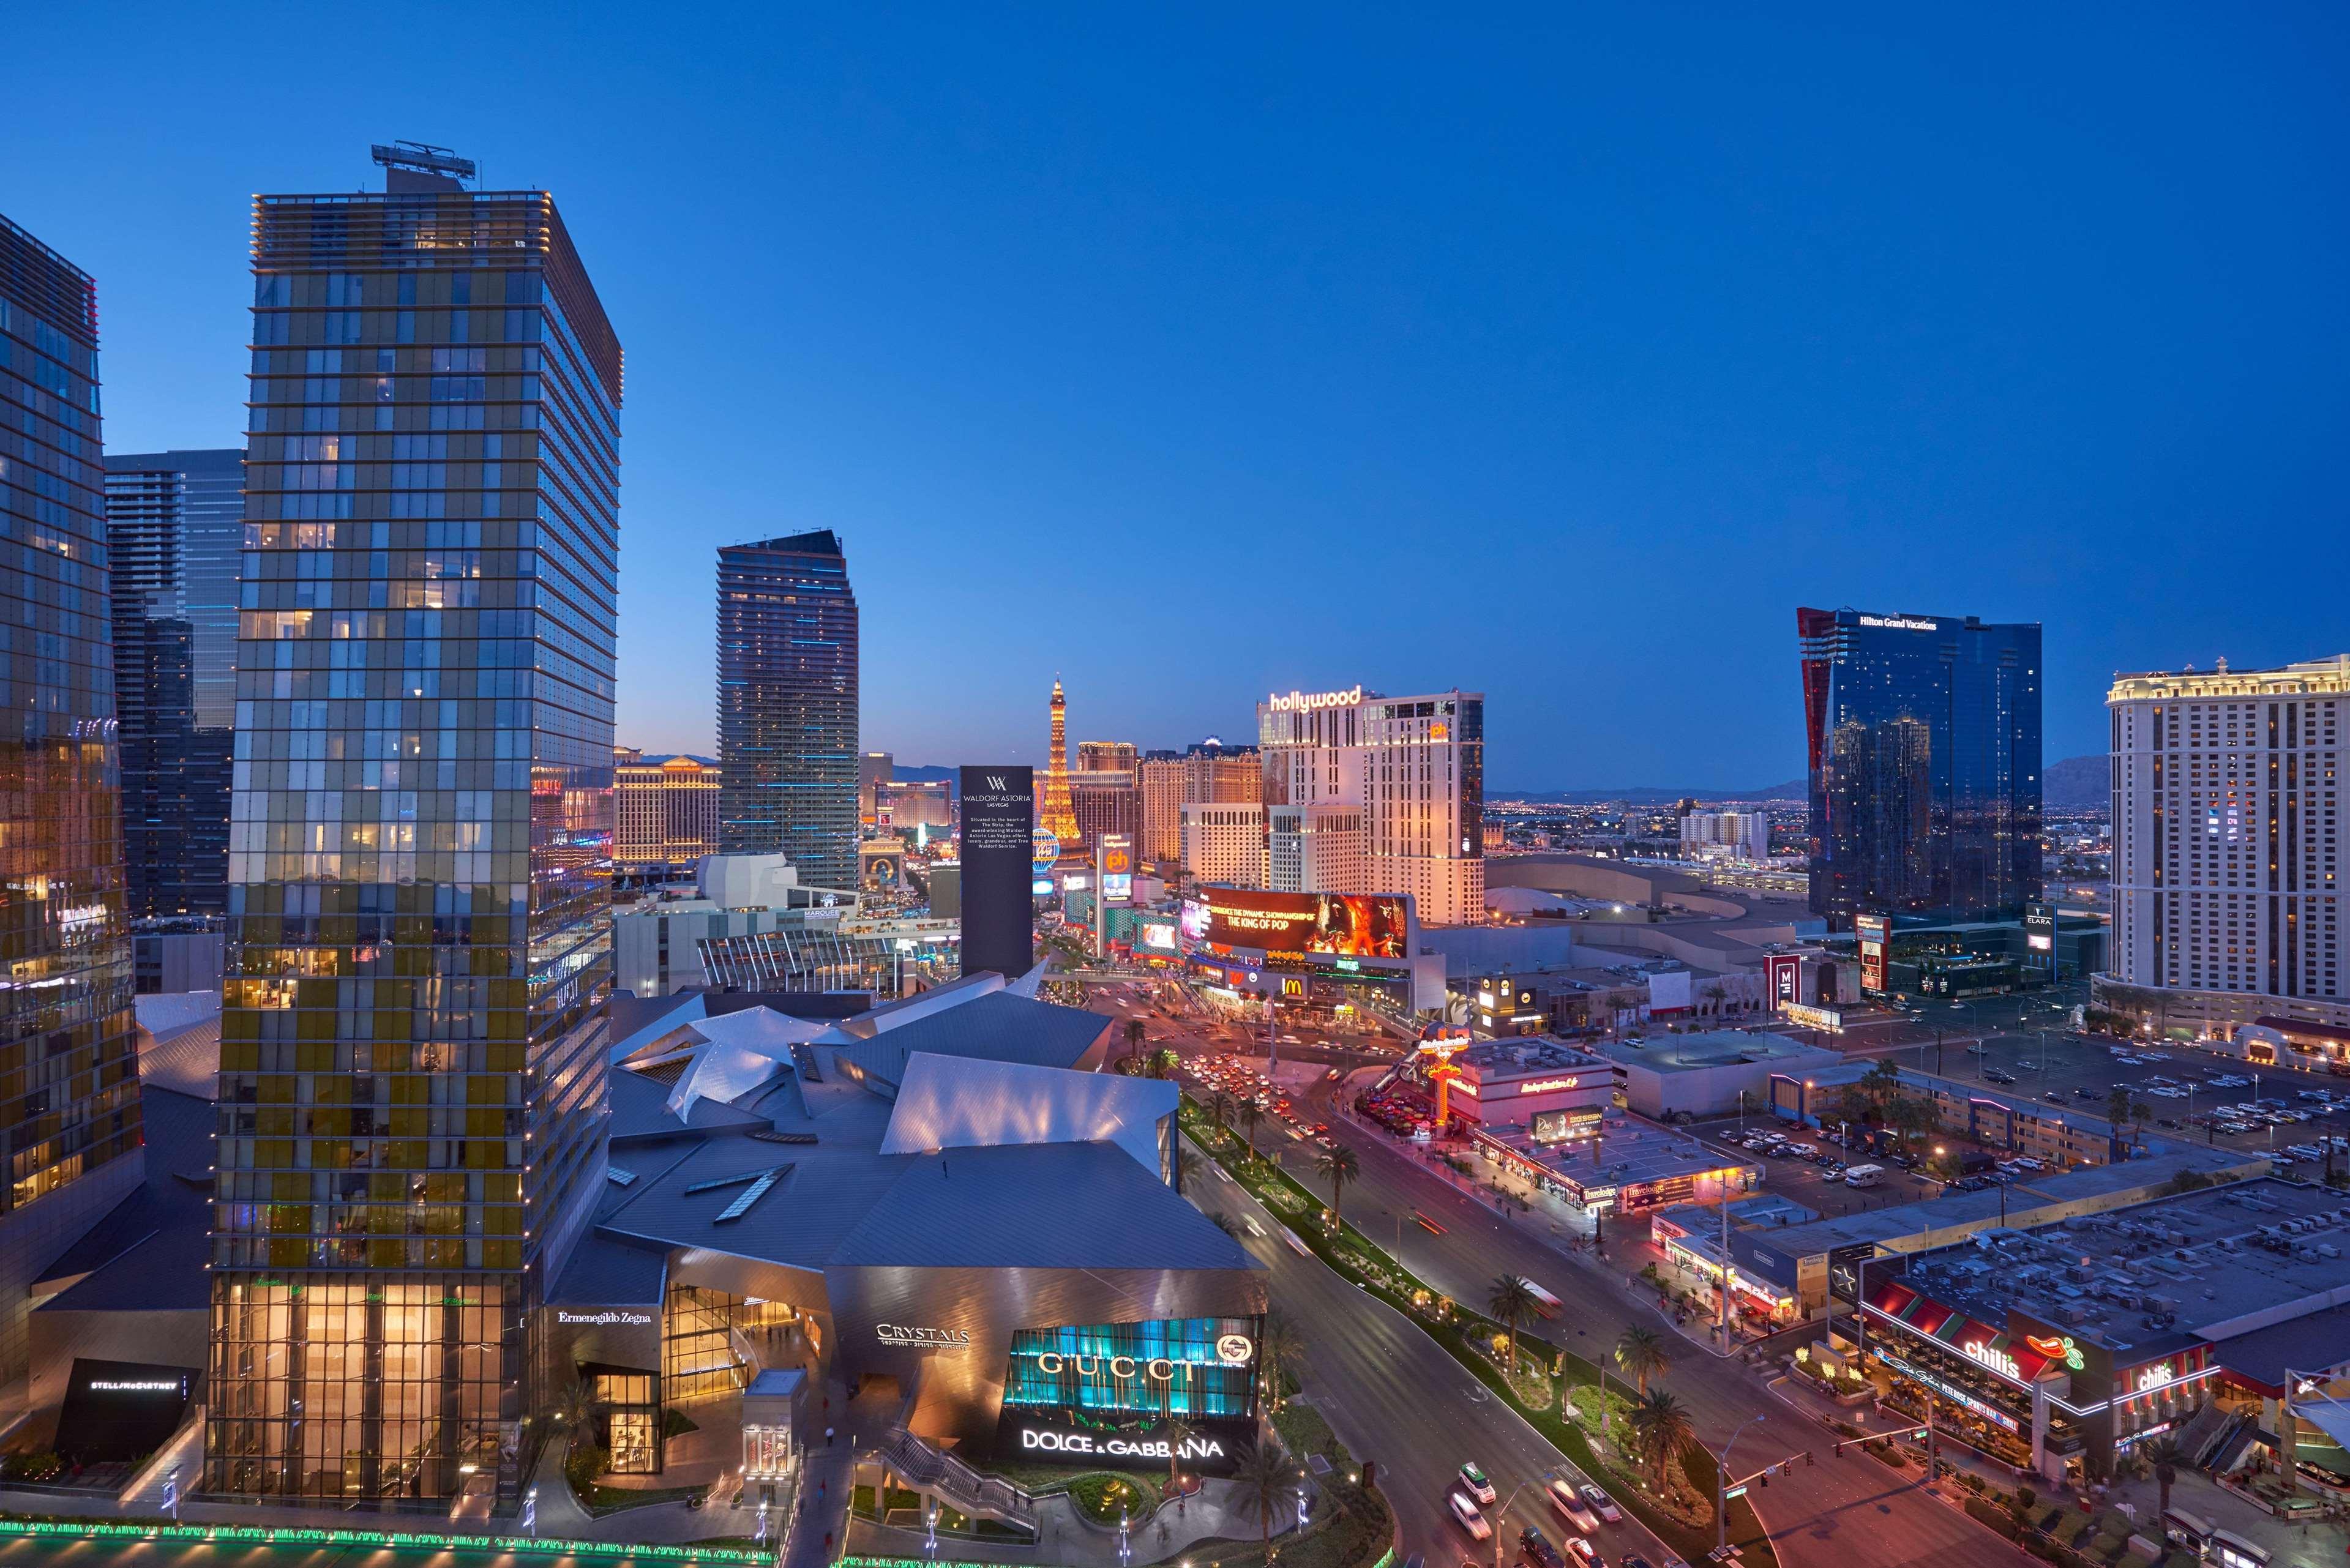 Waldorf Astoria Las Vegas image 1